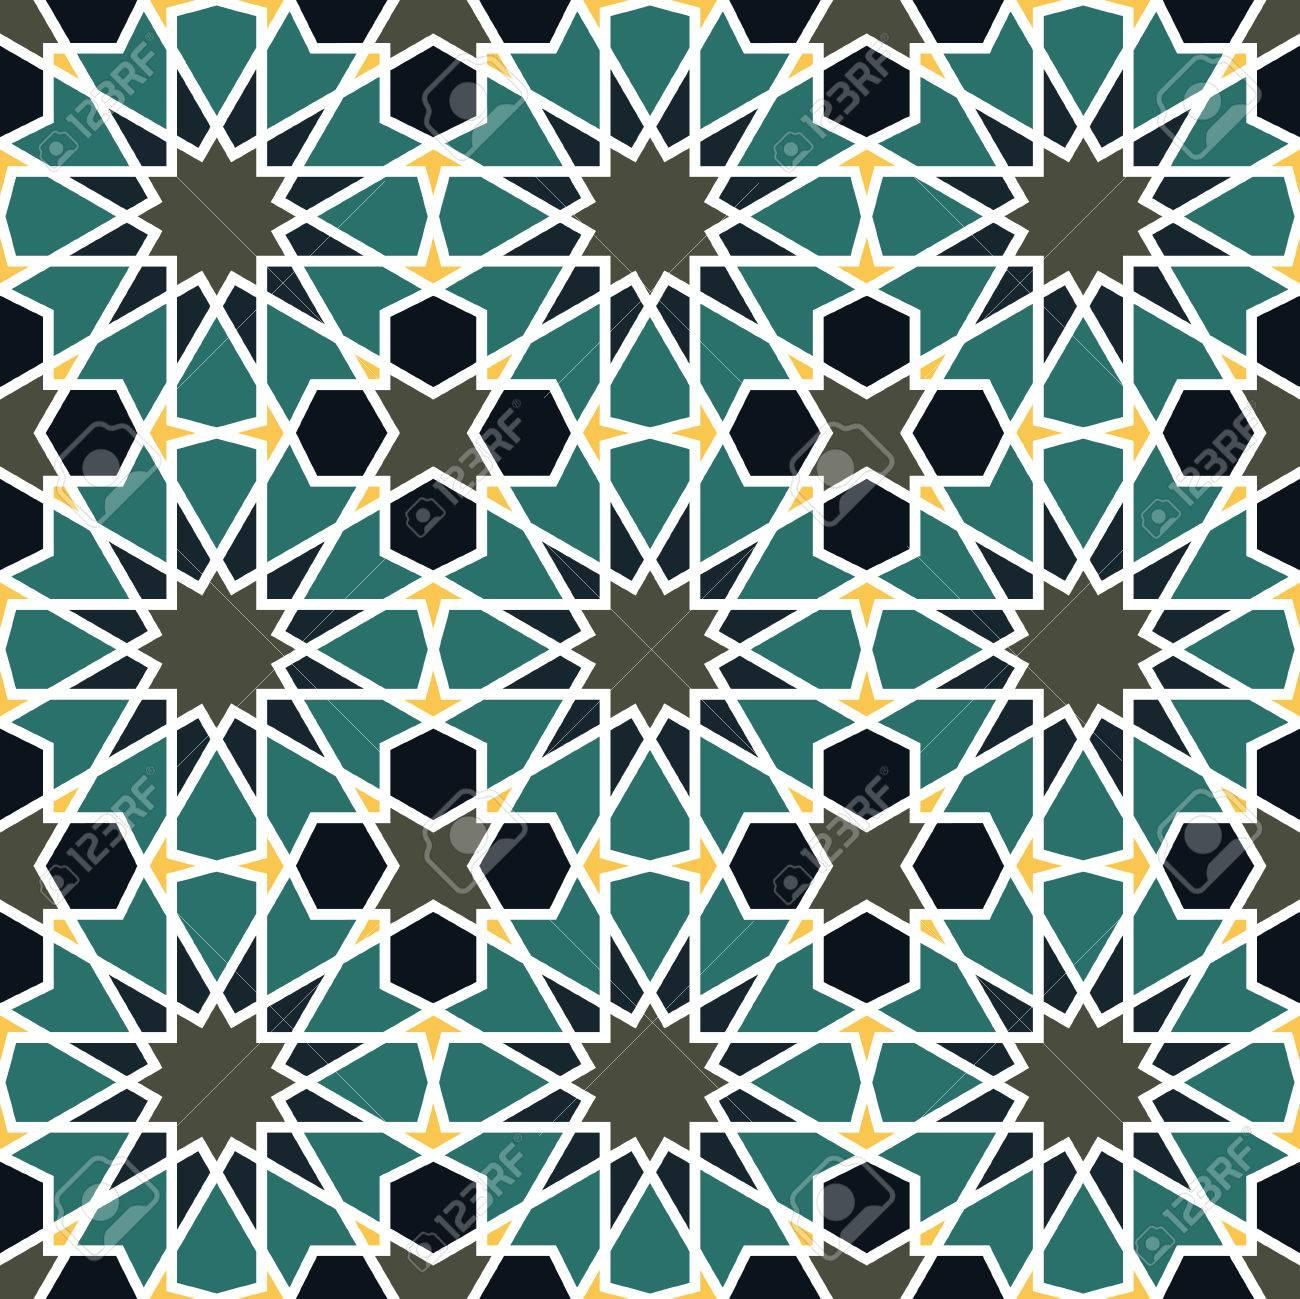 Wonderbaar Naadloos Patroon In Marokkaanse Stijl. Mozaïek Tegel. Islamitische CG-27